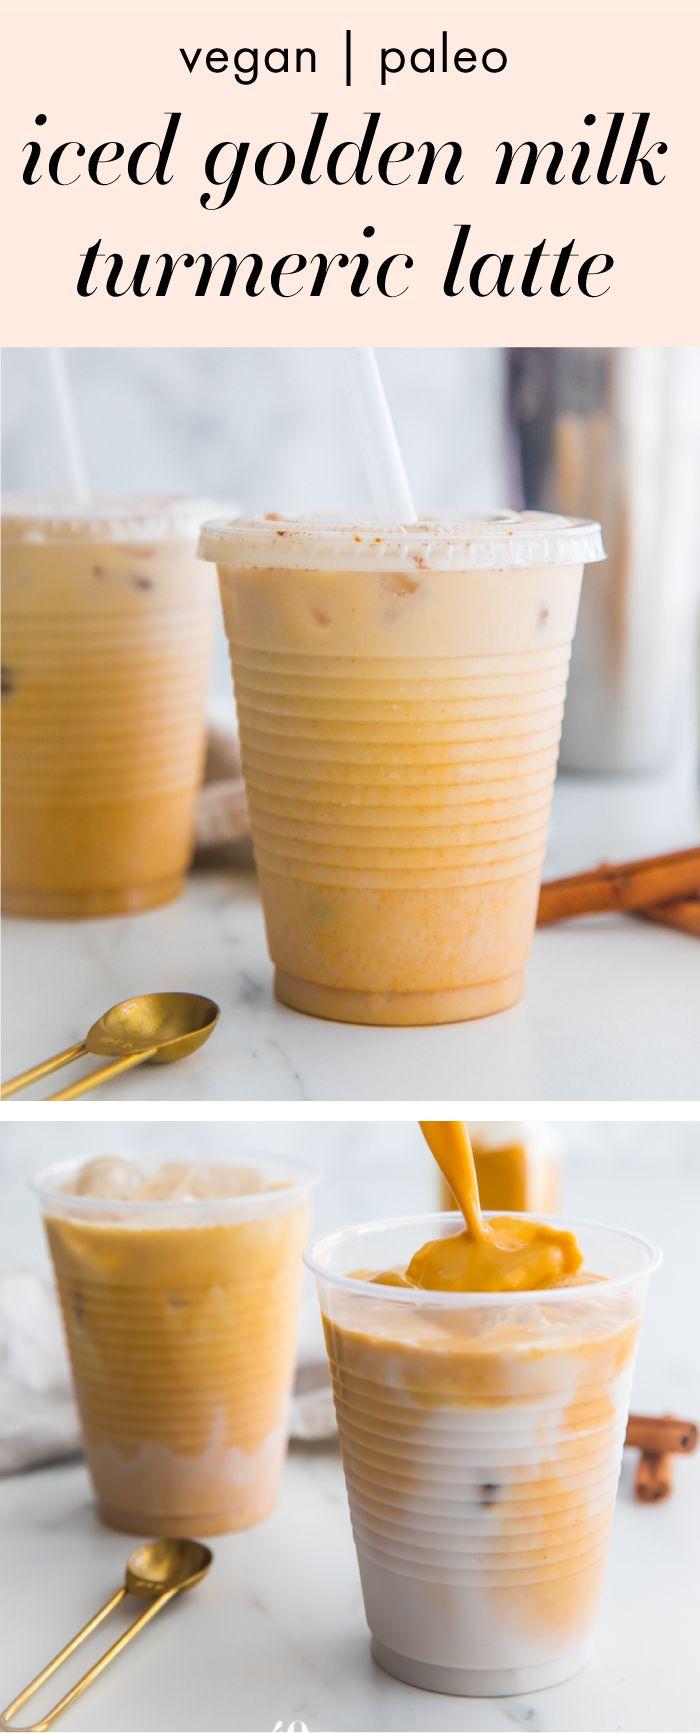 Iced Golden Milk Turmeric Latte (Paleo, Vegan, Anti-Inflammatory) - 40 Aprons